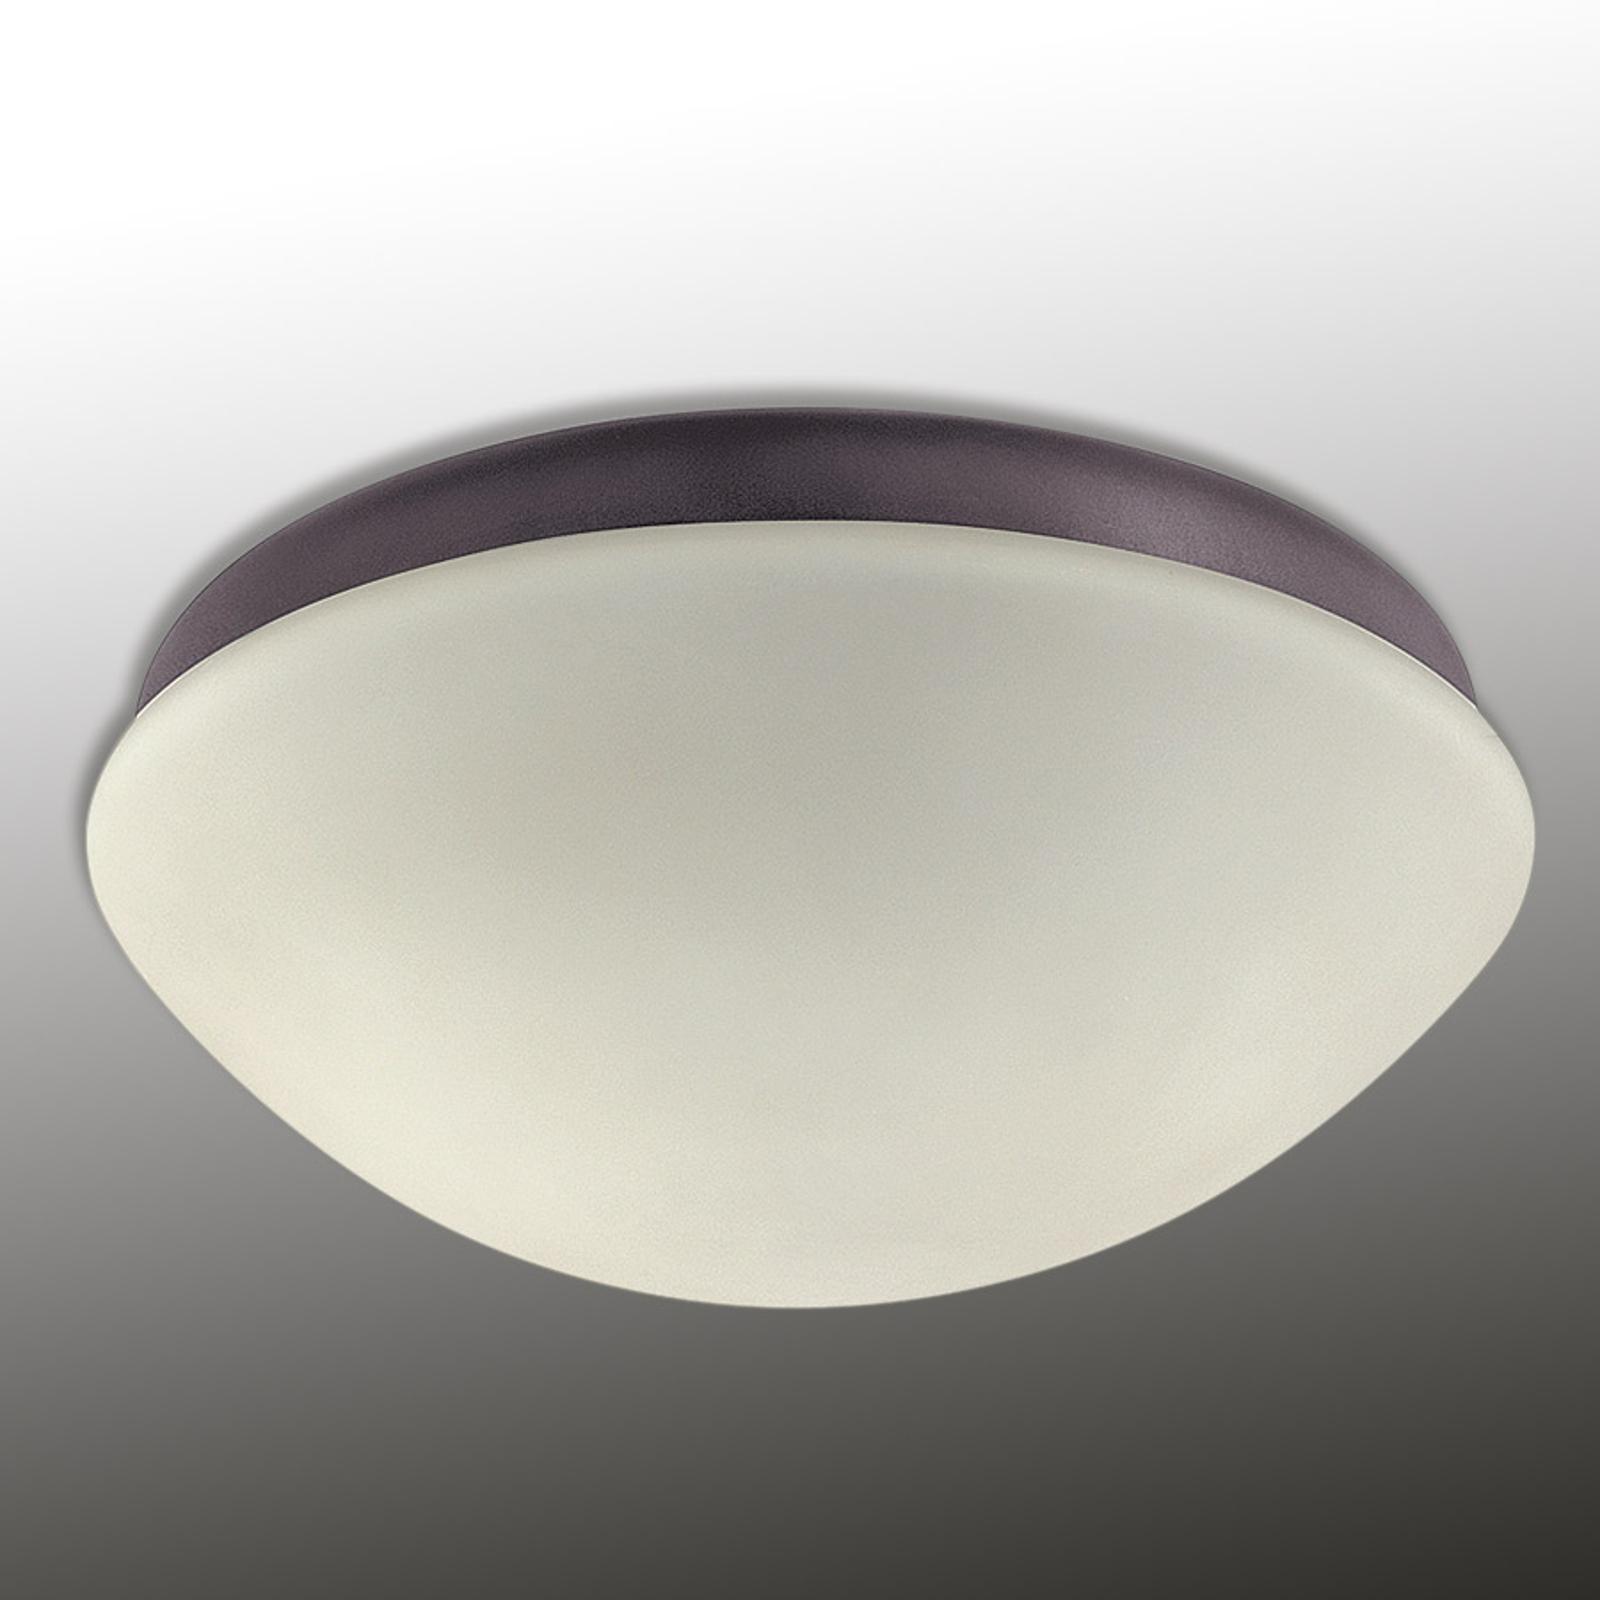 Lampe til takvifte Outdoor Elements hvit